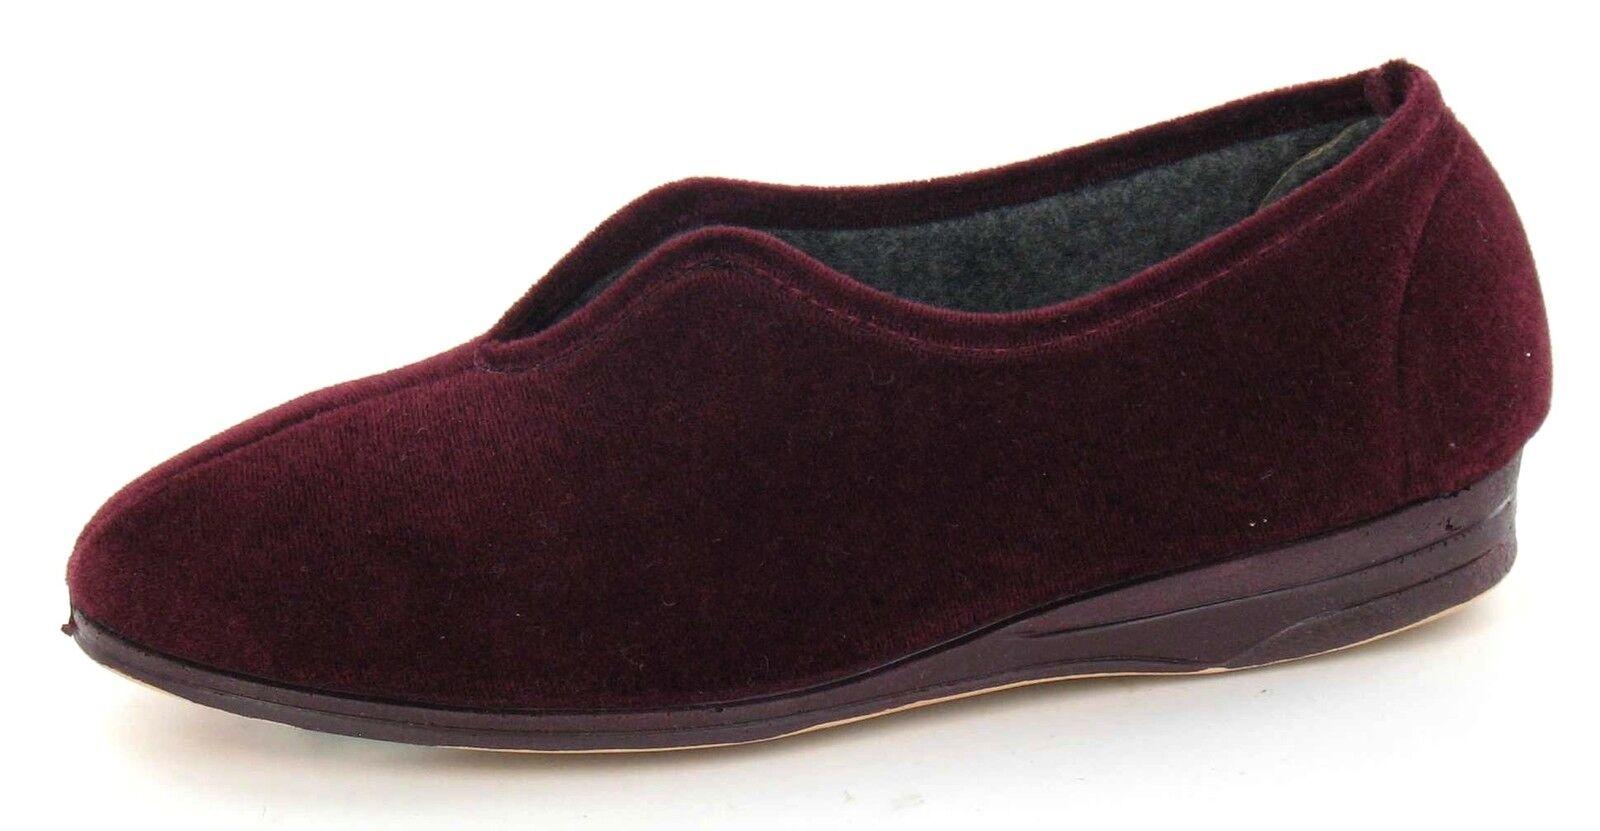 Offerta Ladylove' Mandy ' Donna Vino Pantofole Slip On Intera Tessuto Pantofole Vino 723e00